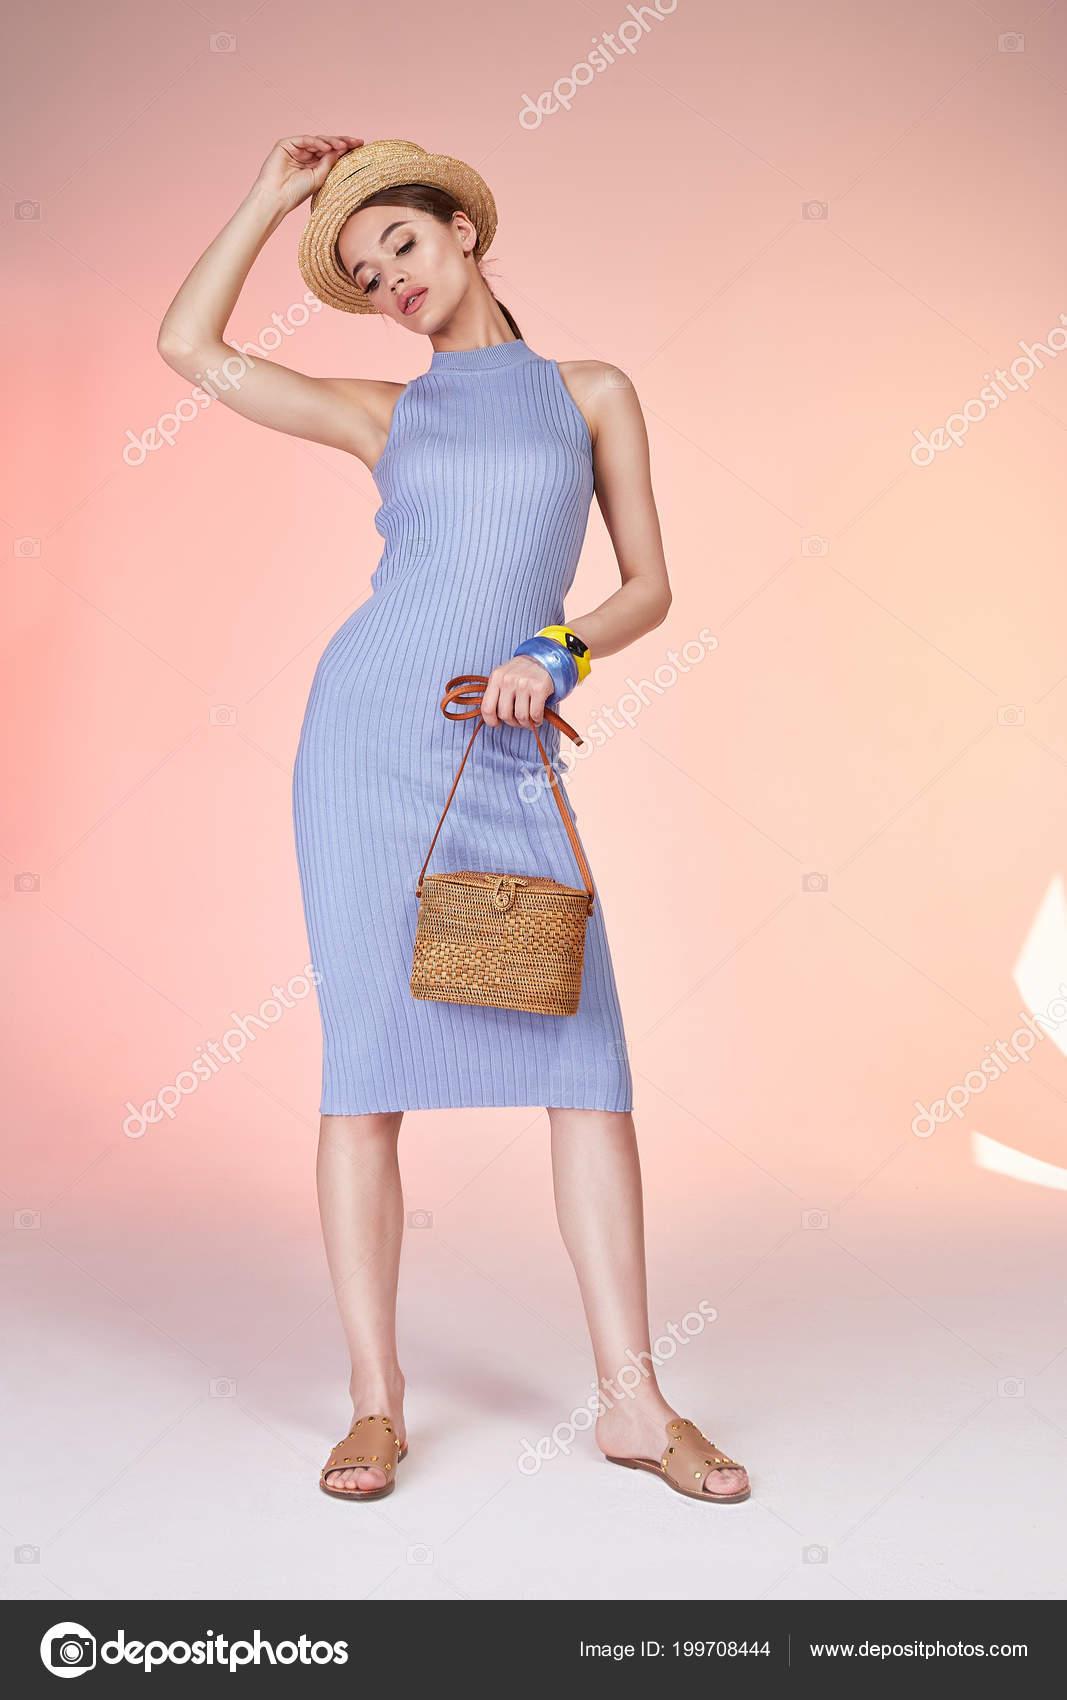 7372691ed3ec Σέξι μελαχρινή γυναίκα φθορά skinny μπλε βαμβακερό φόρεμα μεταξιού  καλοκαίρι συλλογή τέλειο σώμα σχήμα δίαιτα το μαύρισμα του δέρματος  κατέχουν στον ...